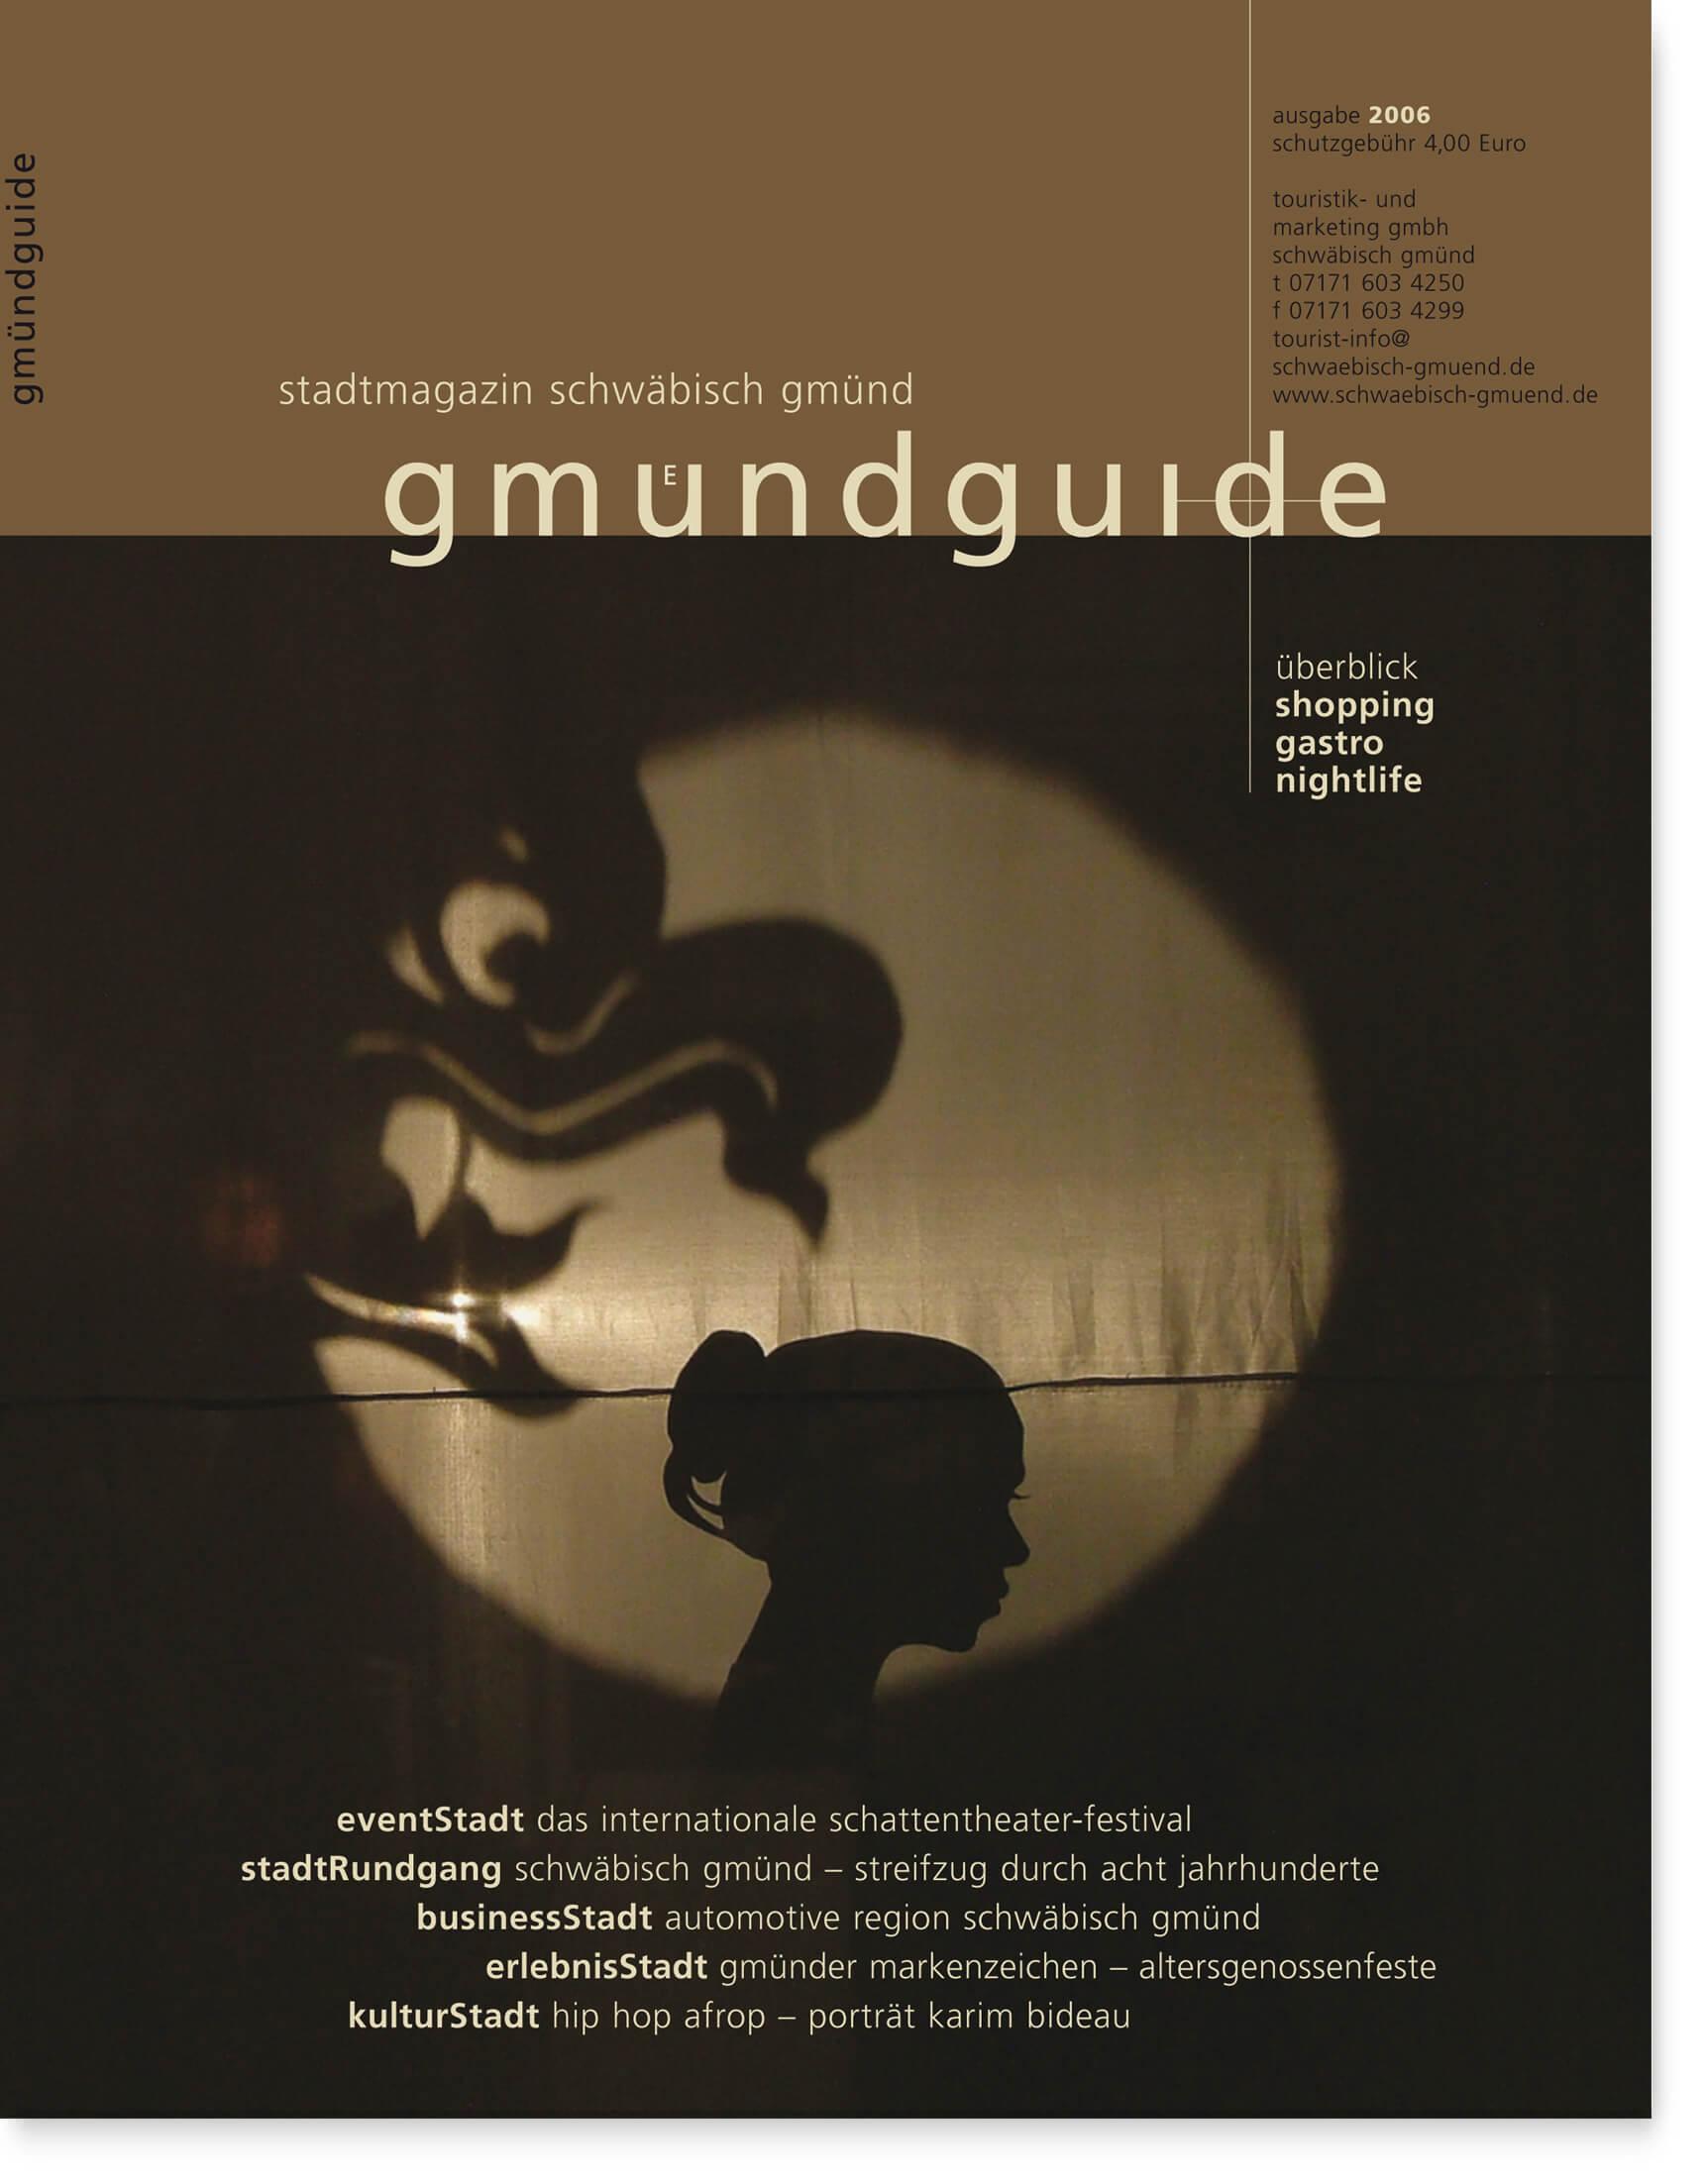 fh-web-gmuendguide-2006-1.jpg